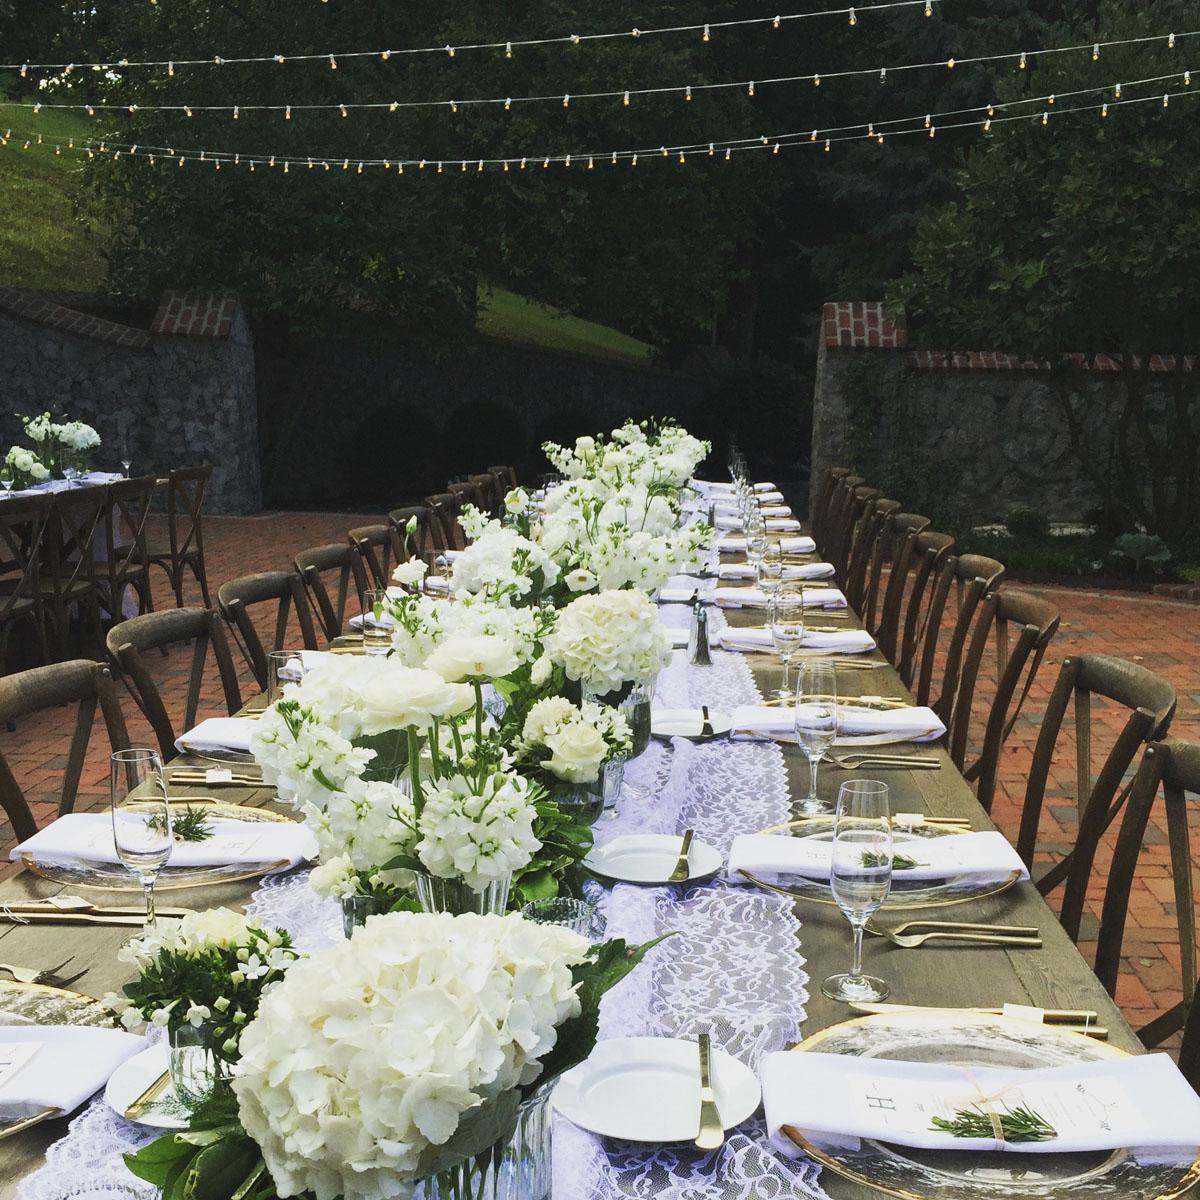 Gorgeous wedding decorations